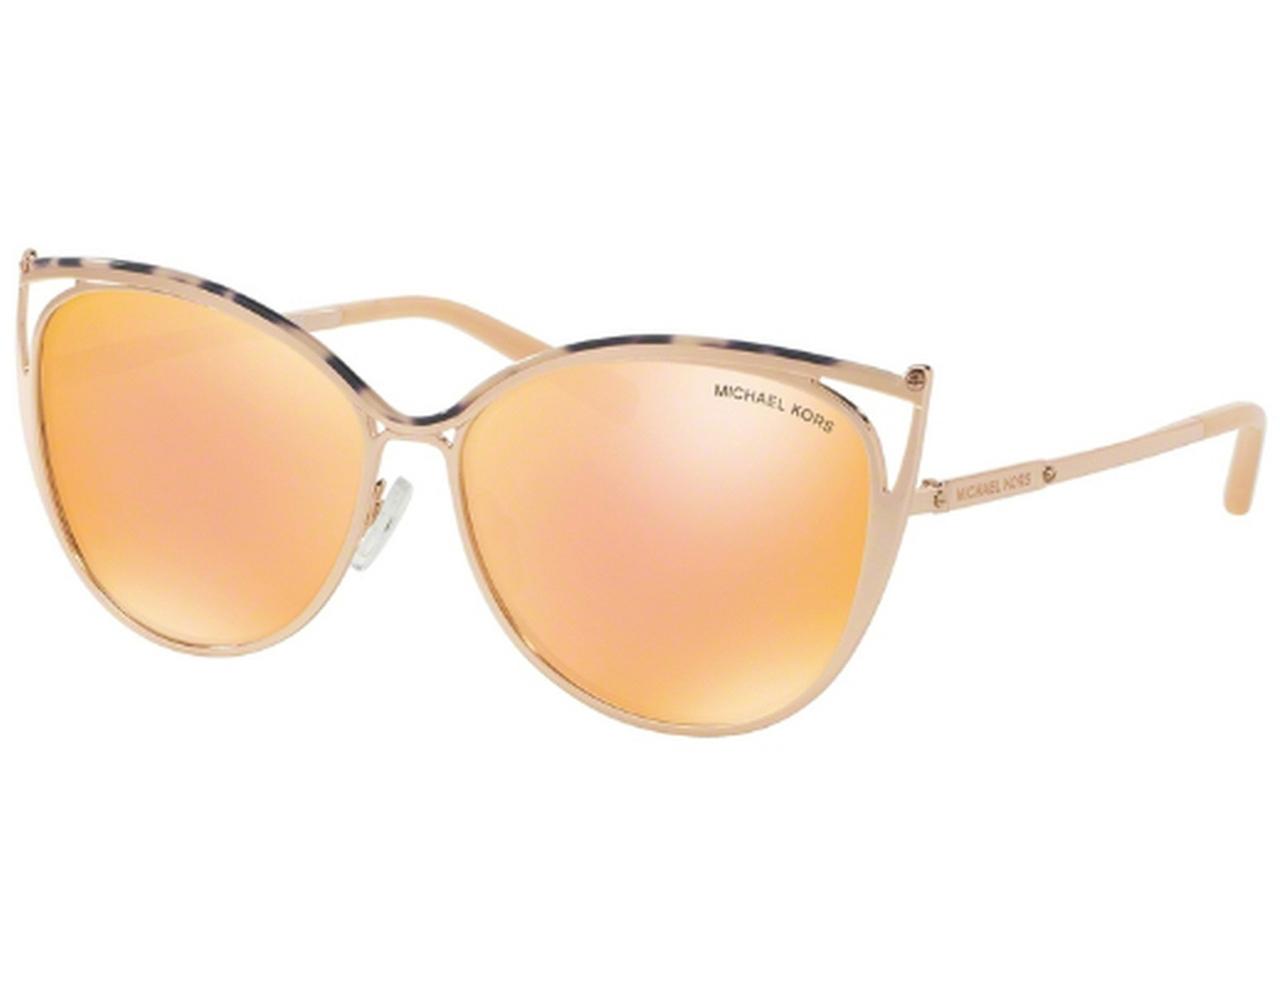 ab7fa9086c37 Details about NEW Michael Kors MK1020-11657J Pink / Gold 56mm Sunglasses